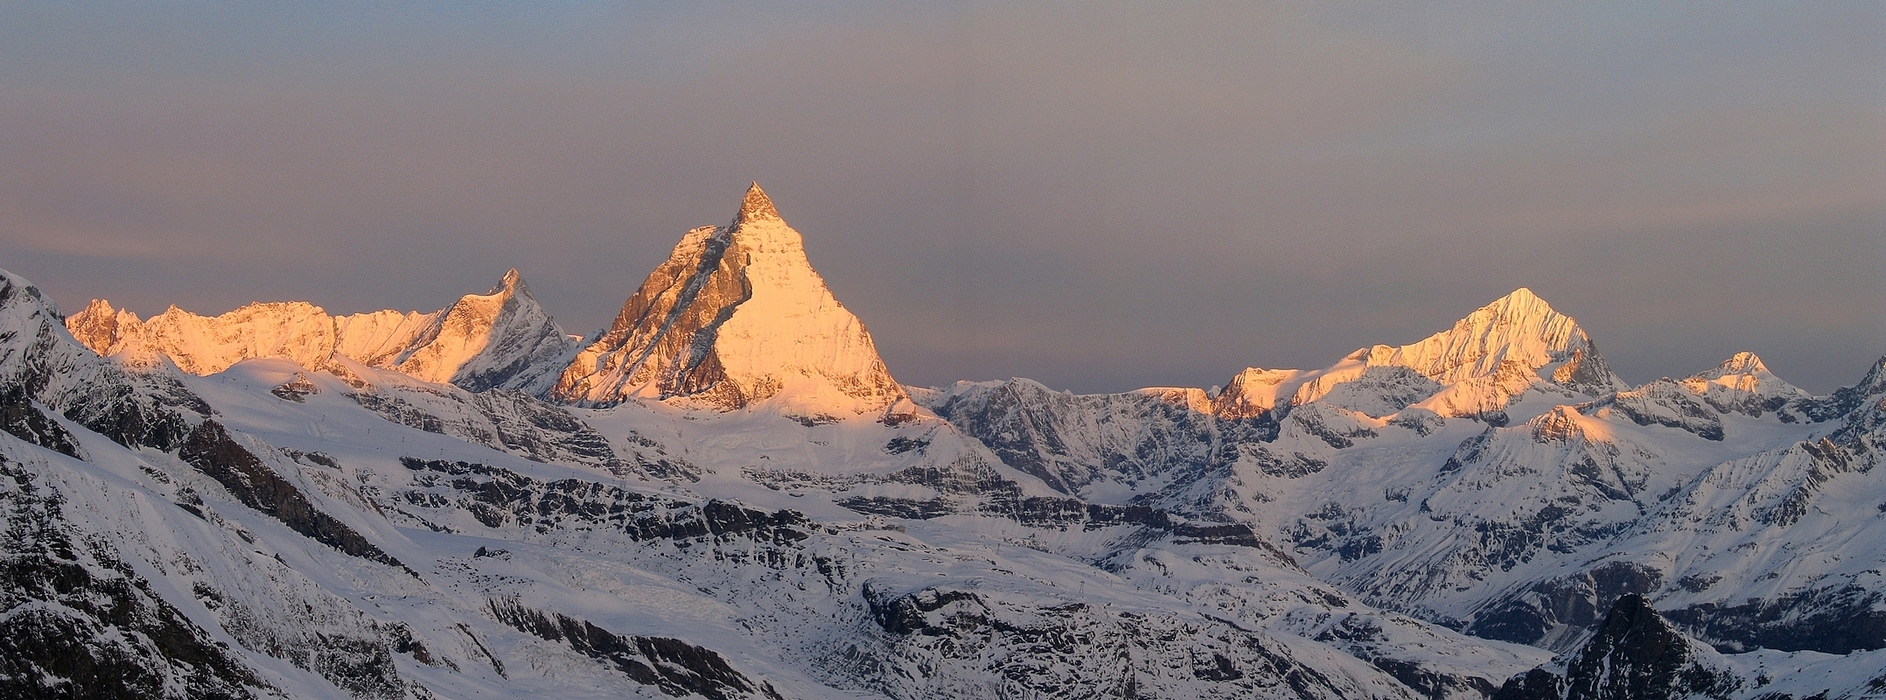 Nordend - Monte Rosa Walliser Alpen / Alpes valaisannes Švýcarsko panorama 19